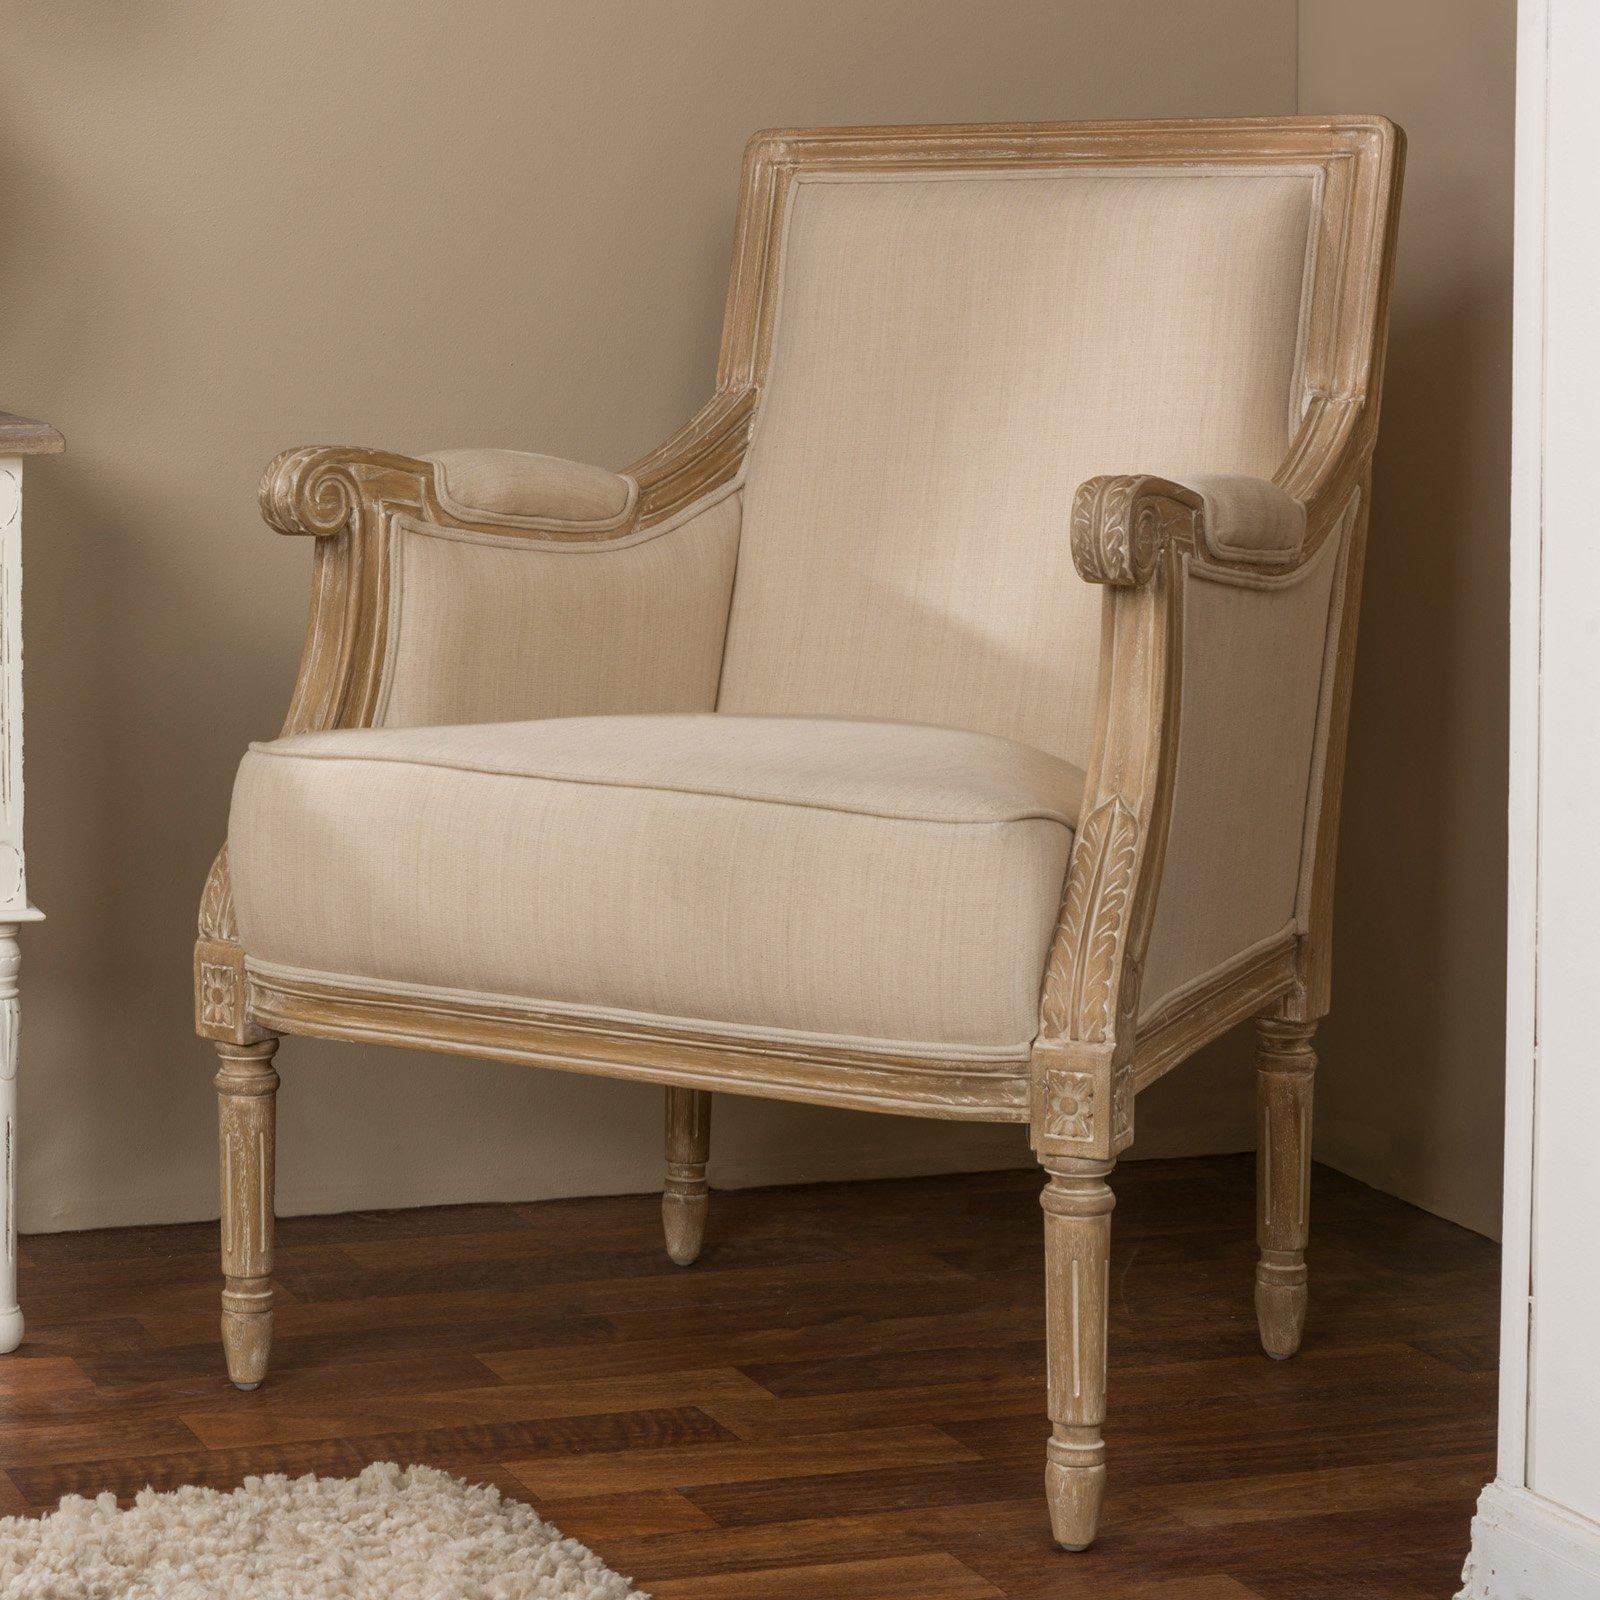 Baxton Studio Chavanon French Accent Chair